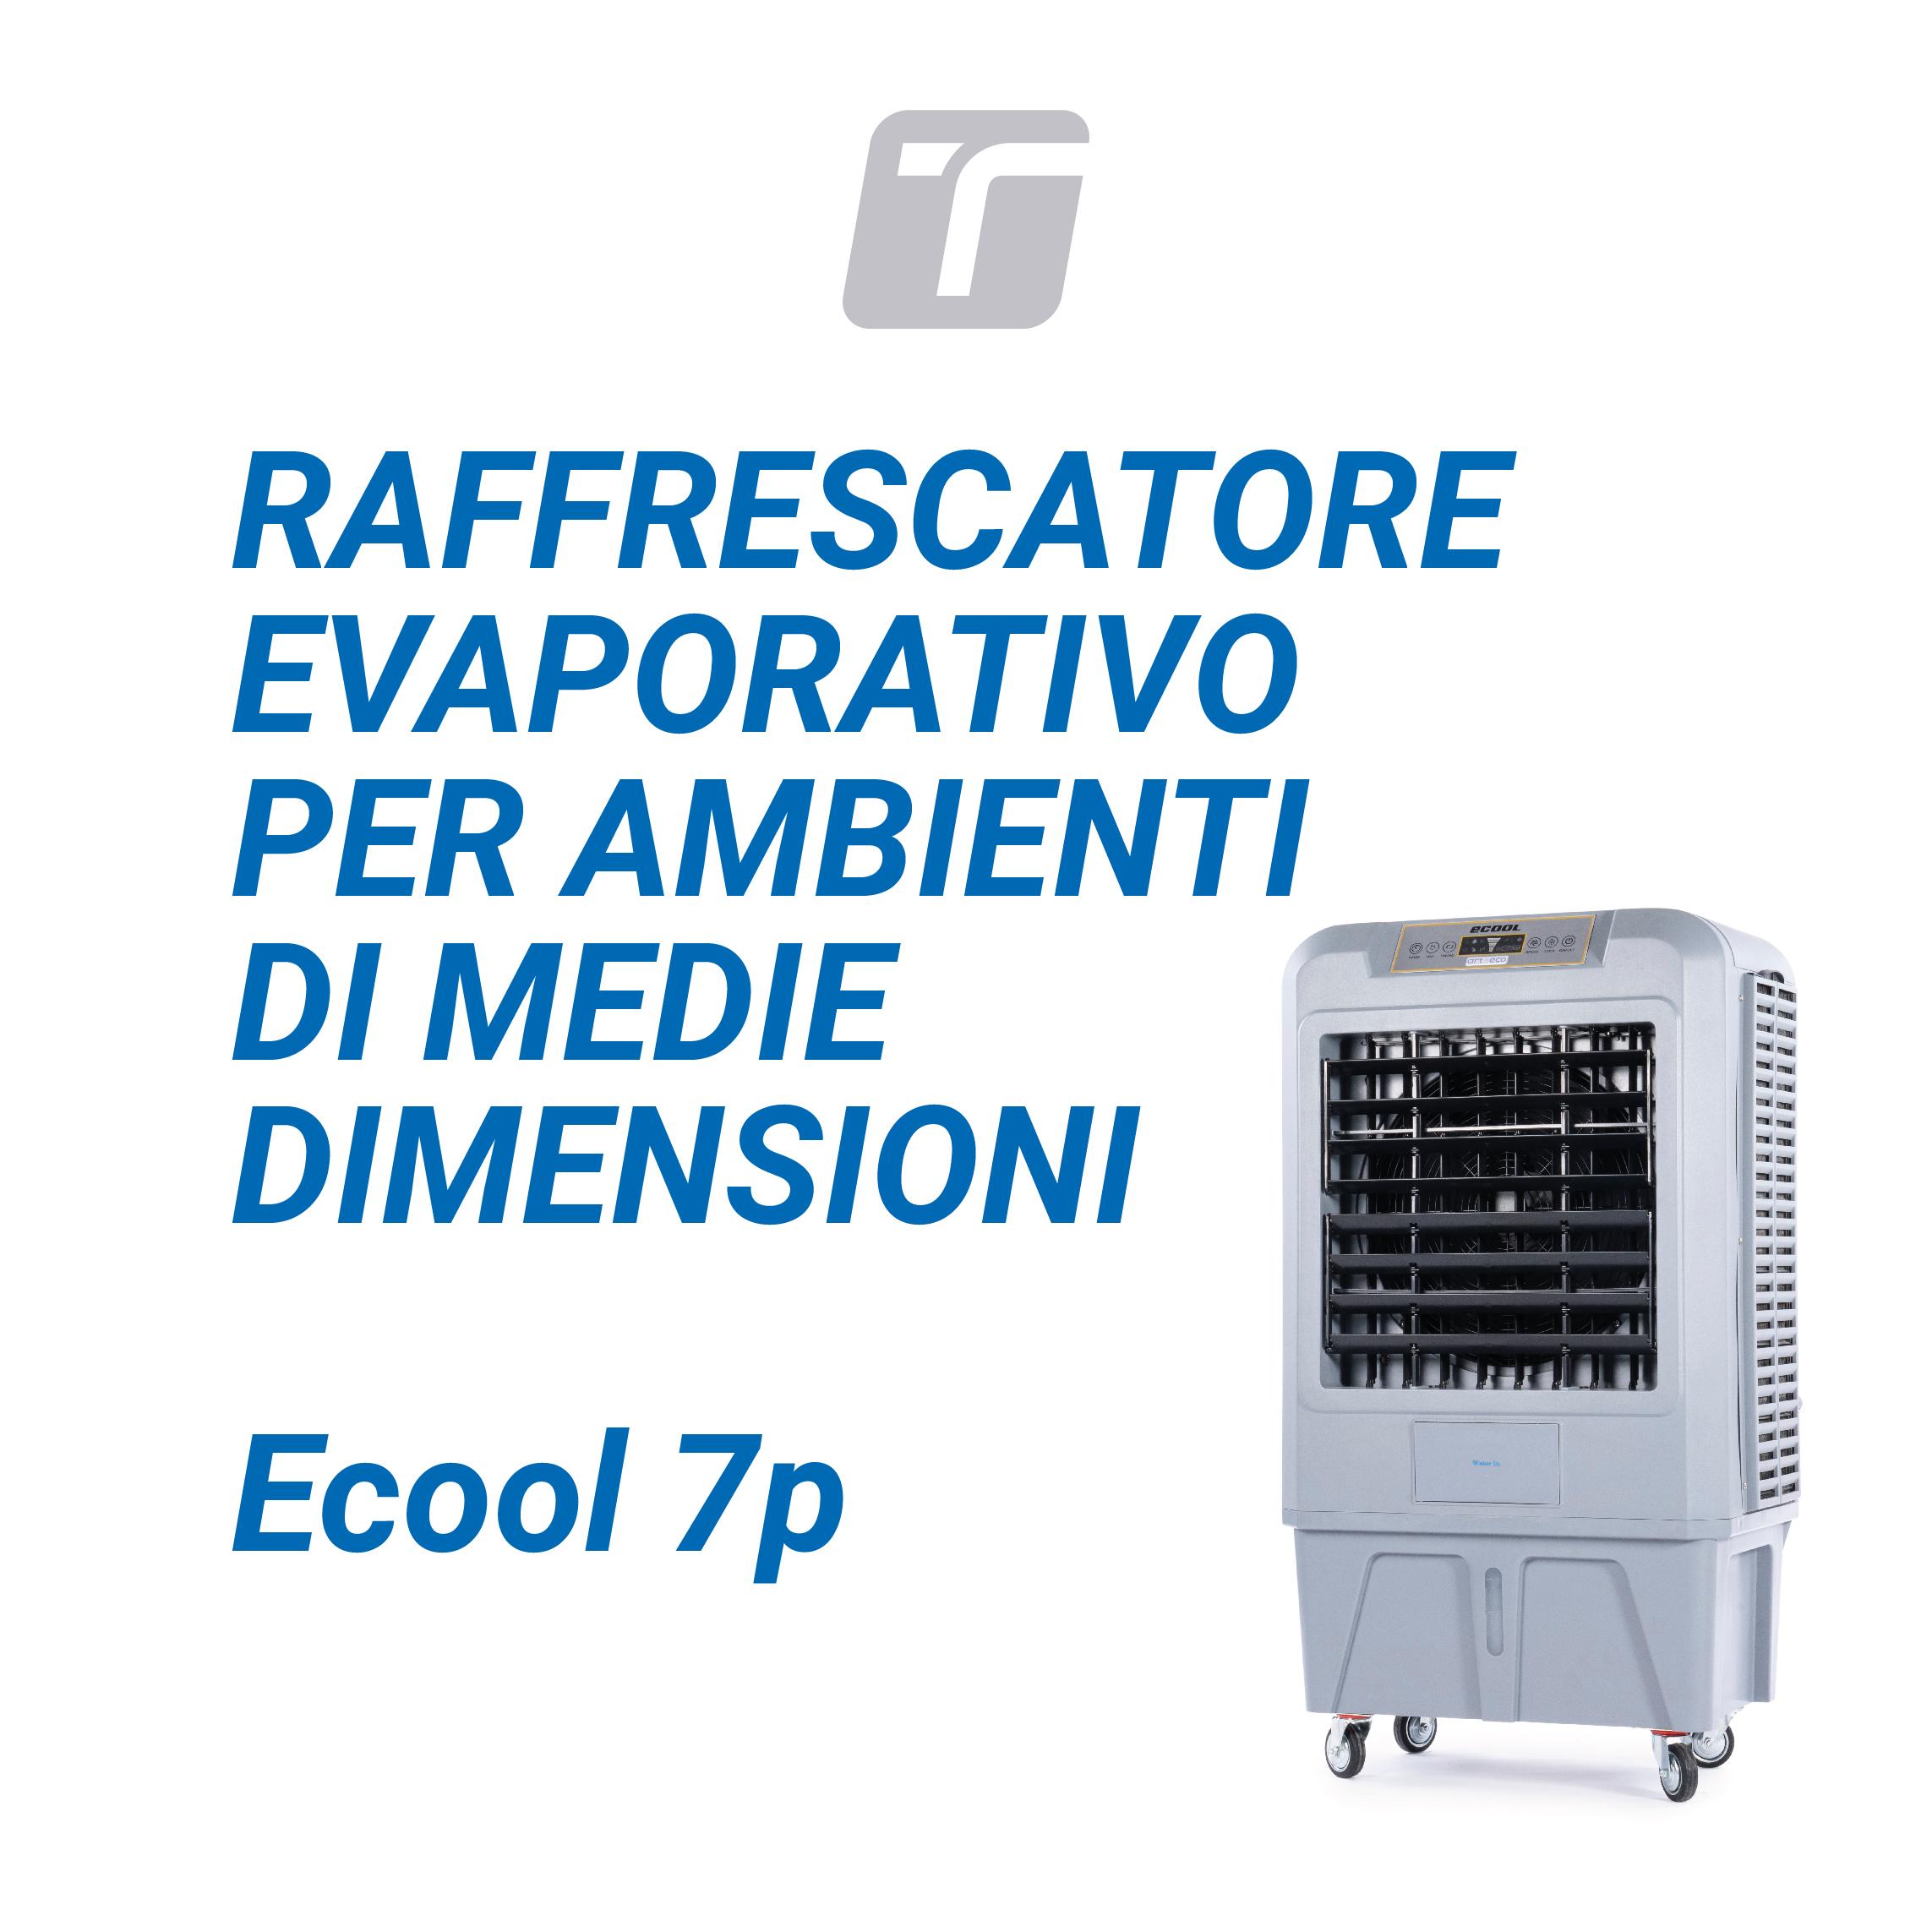 RAFFRESCATORE EVAPORATIVO ECOOL 7P